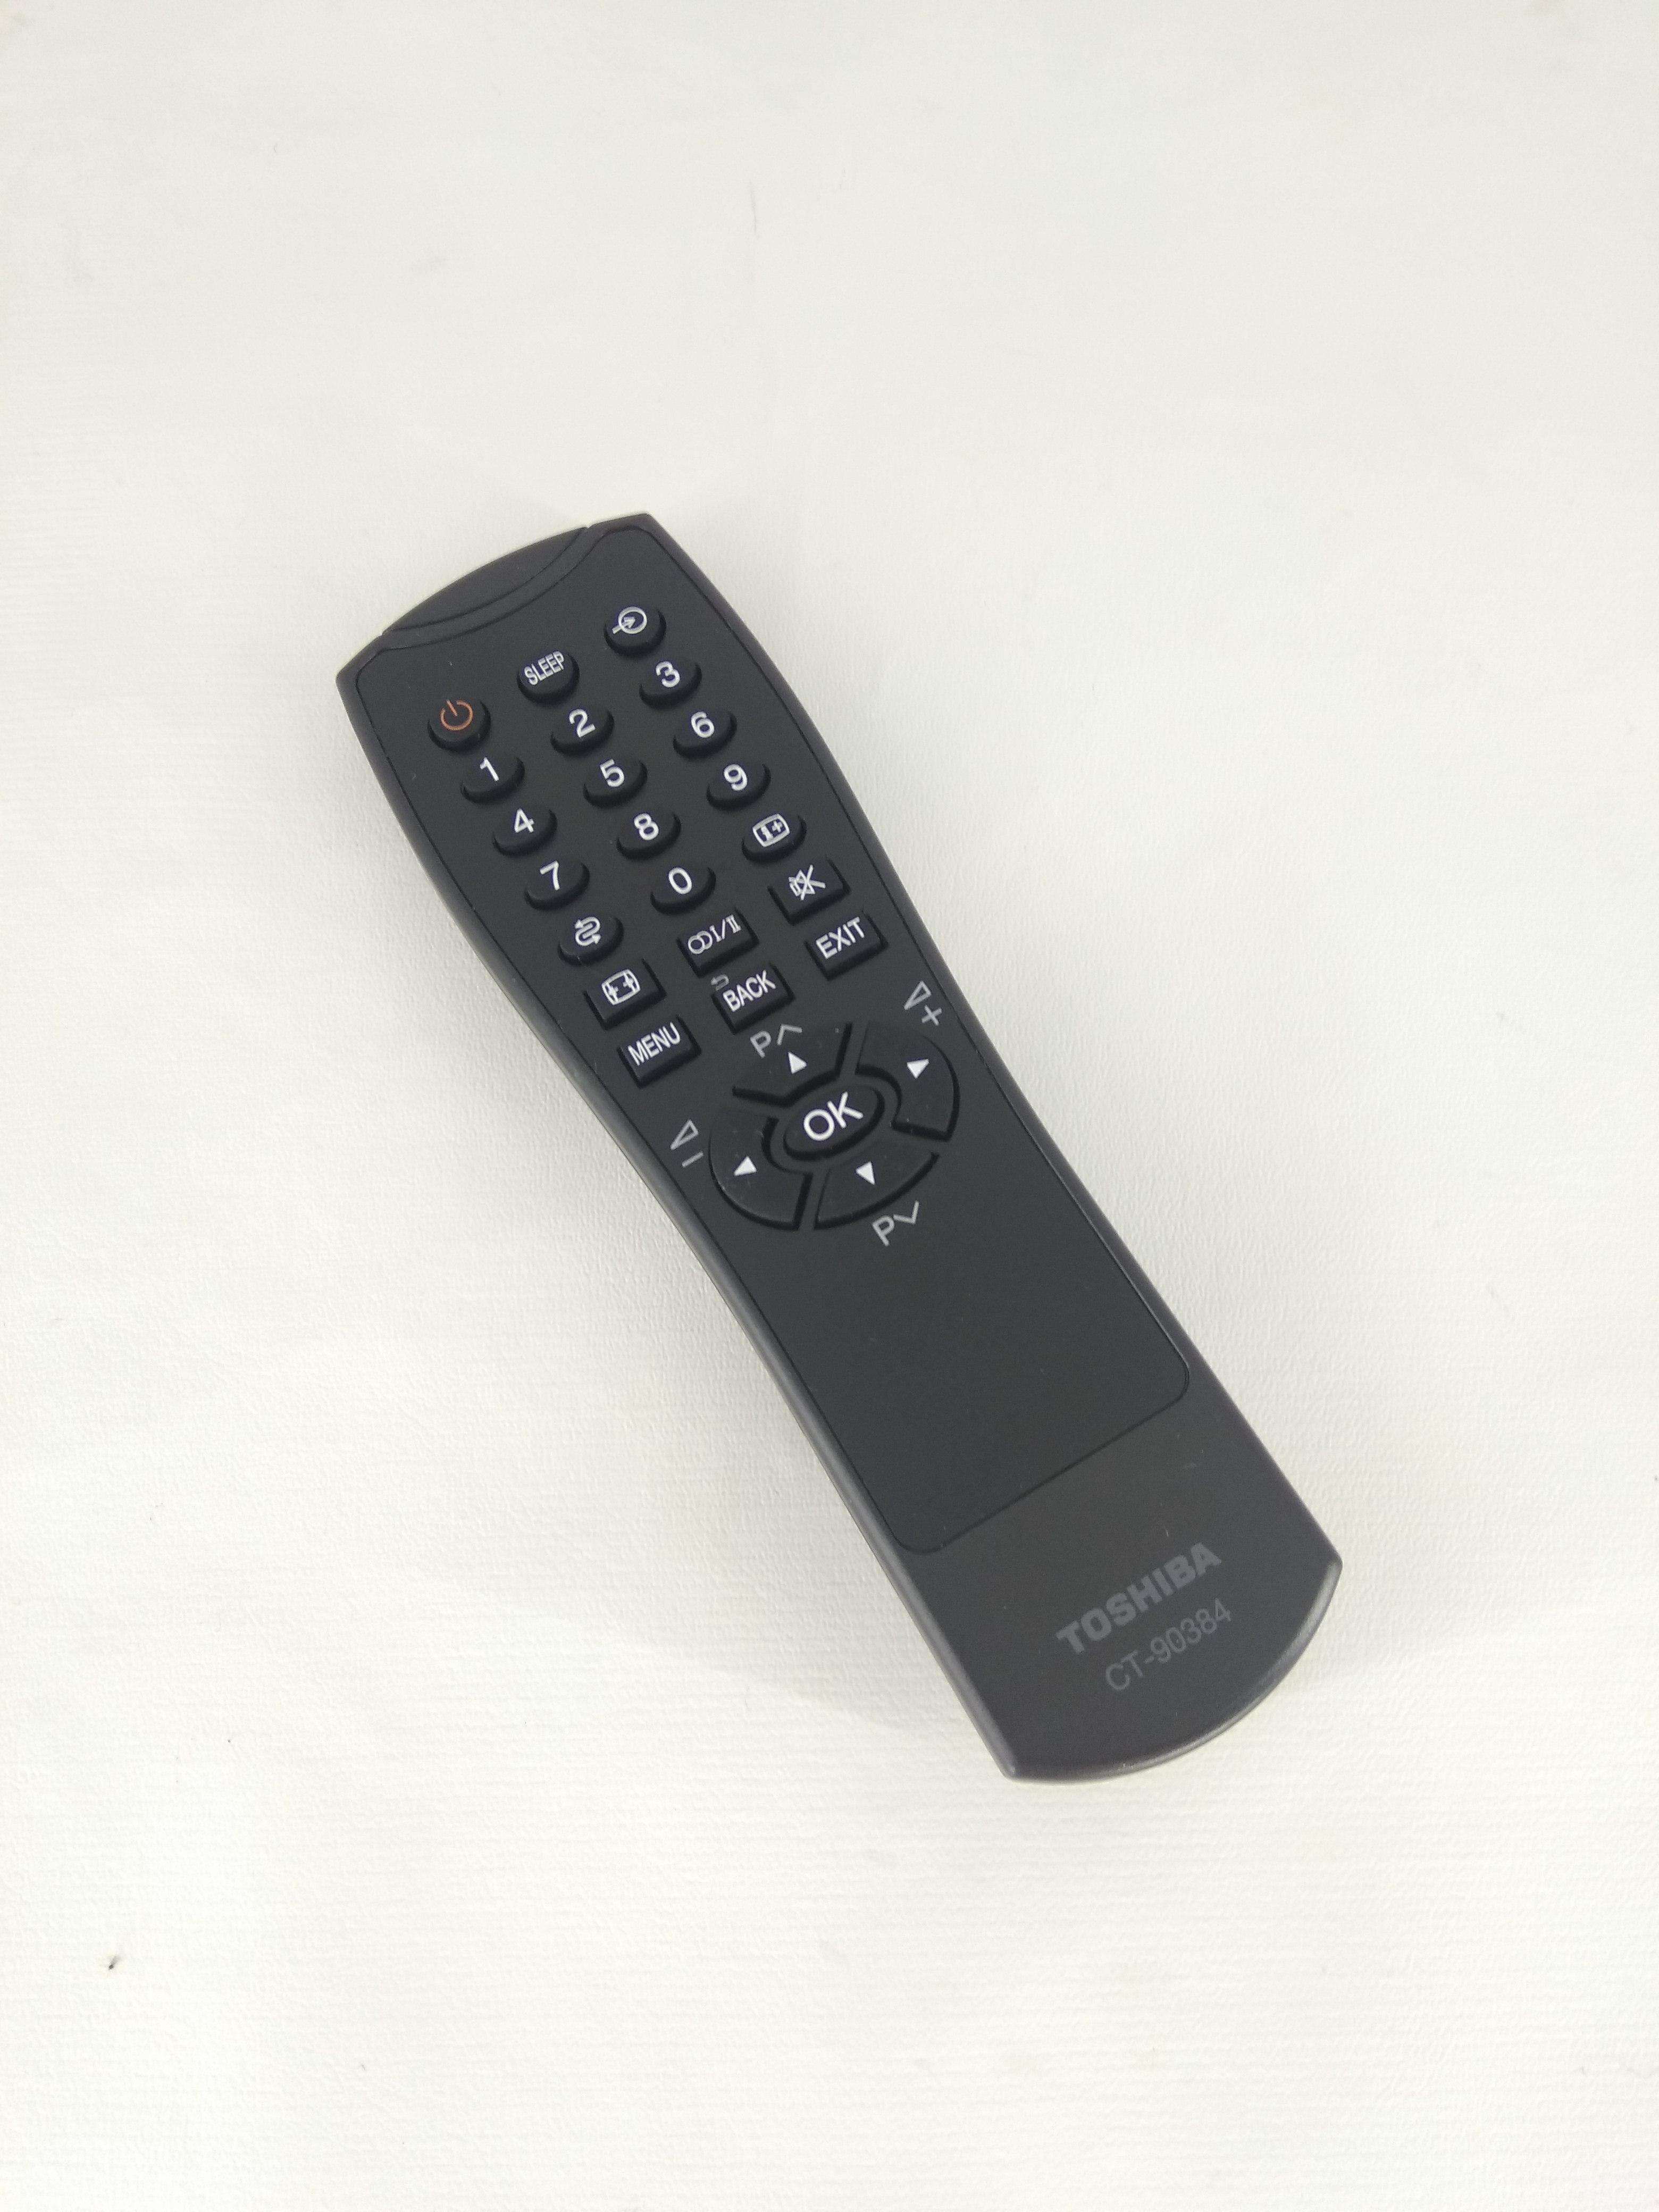 Remot Remote TV Toshiba Regza LCD / LED CT-90384 Ori / Original Toshiba Power TV 19HV15E